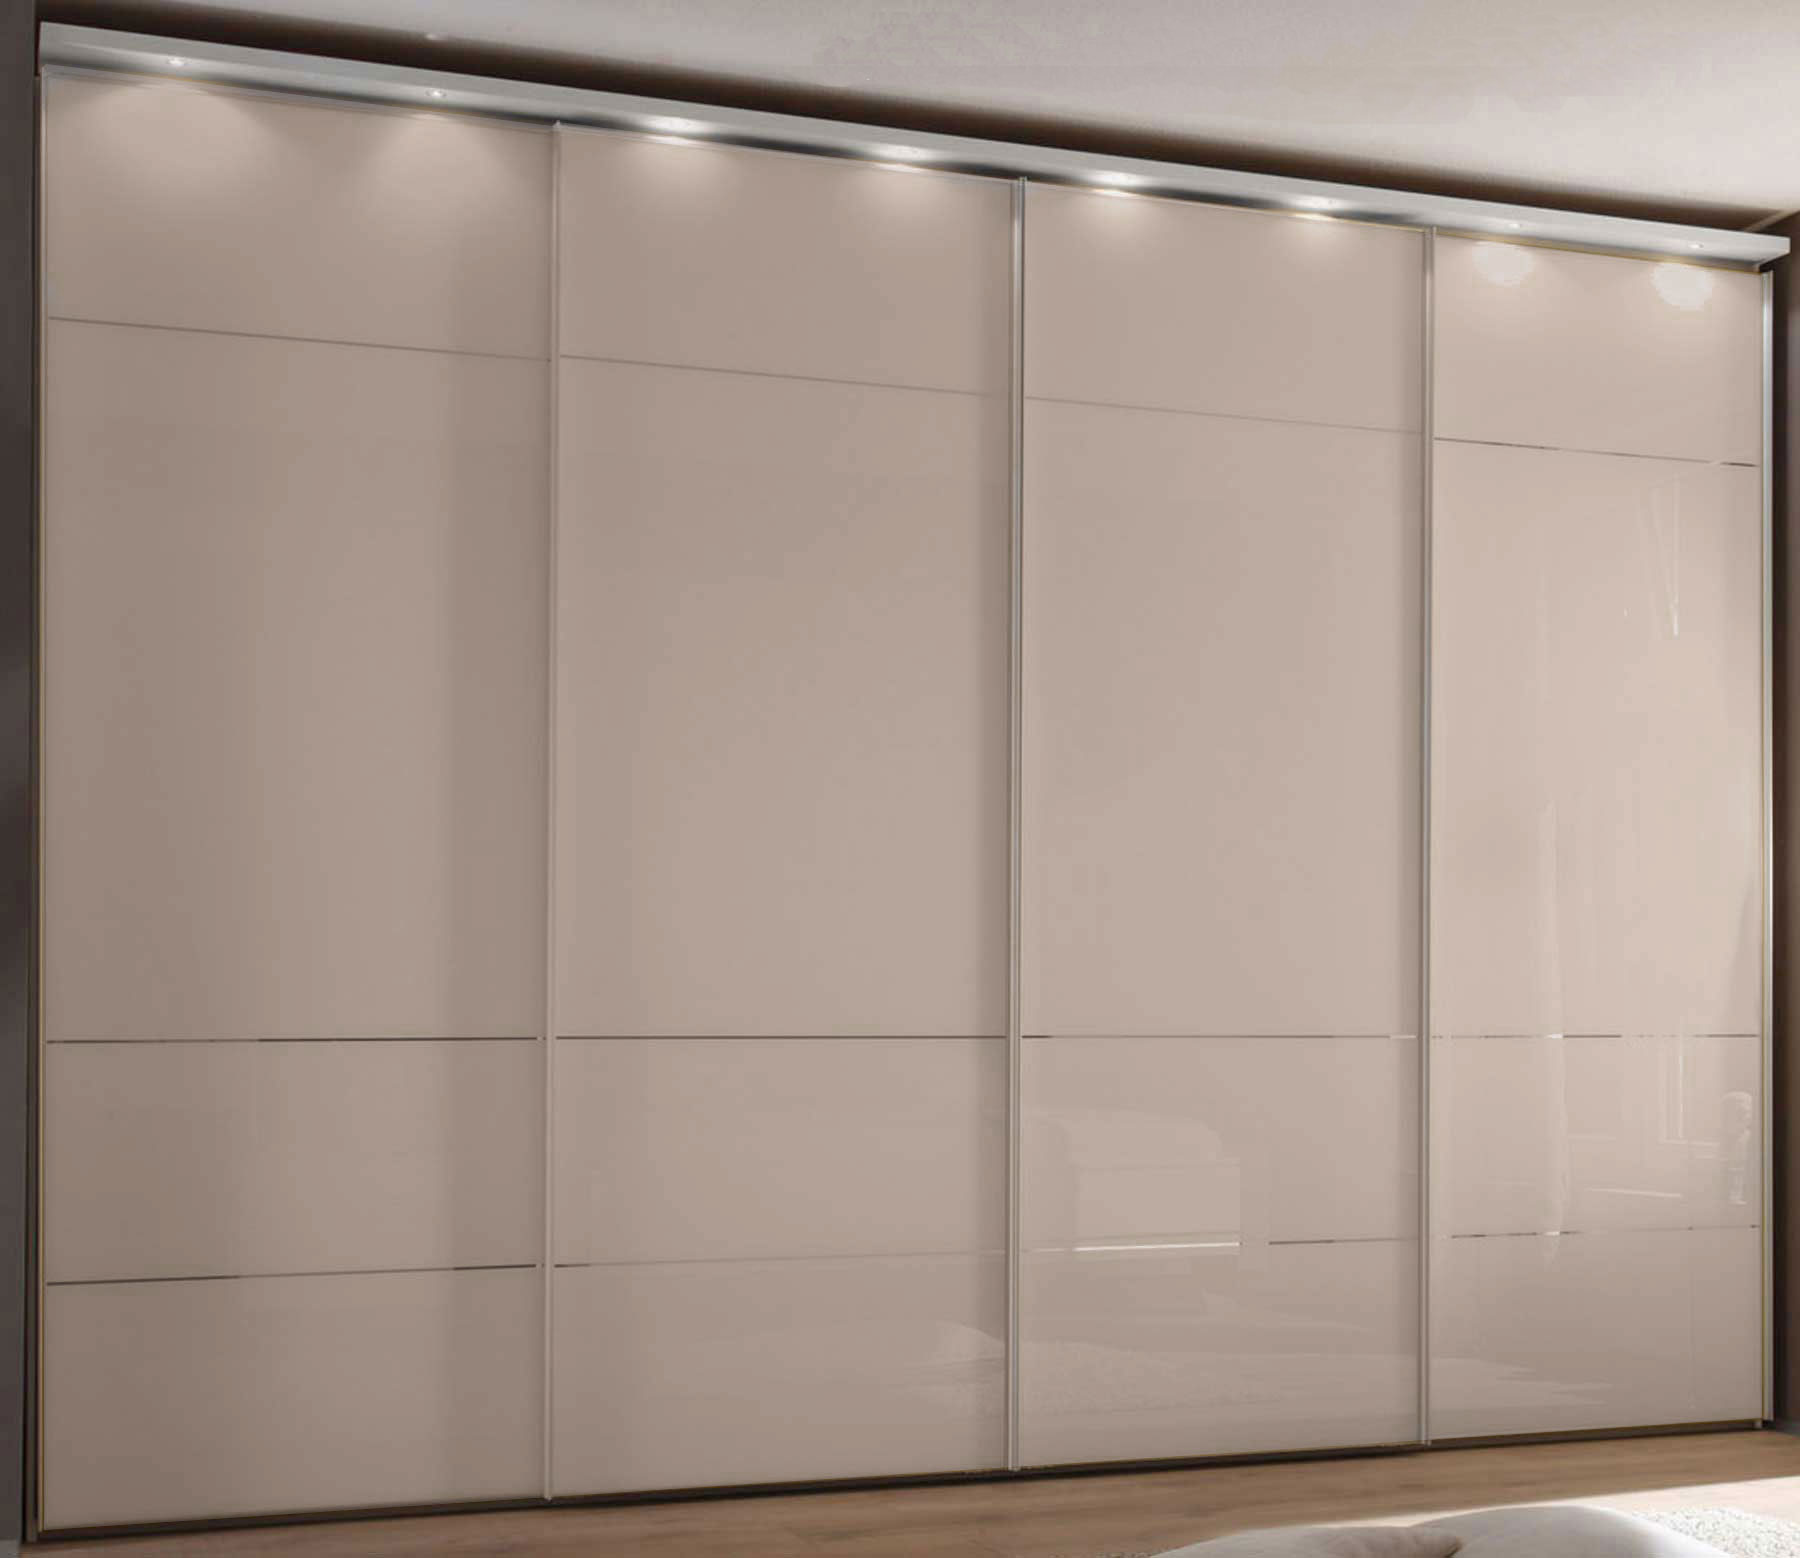 Staud Sonate Lucca Panoramaschrank Glas